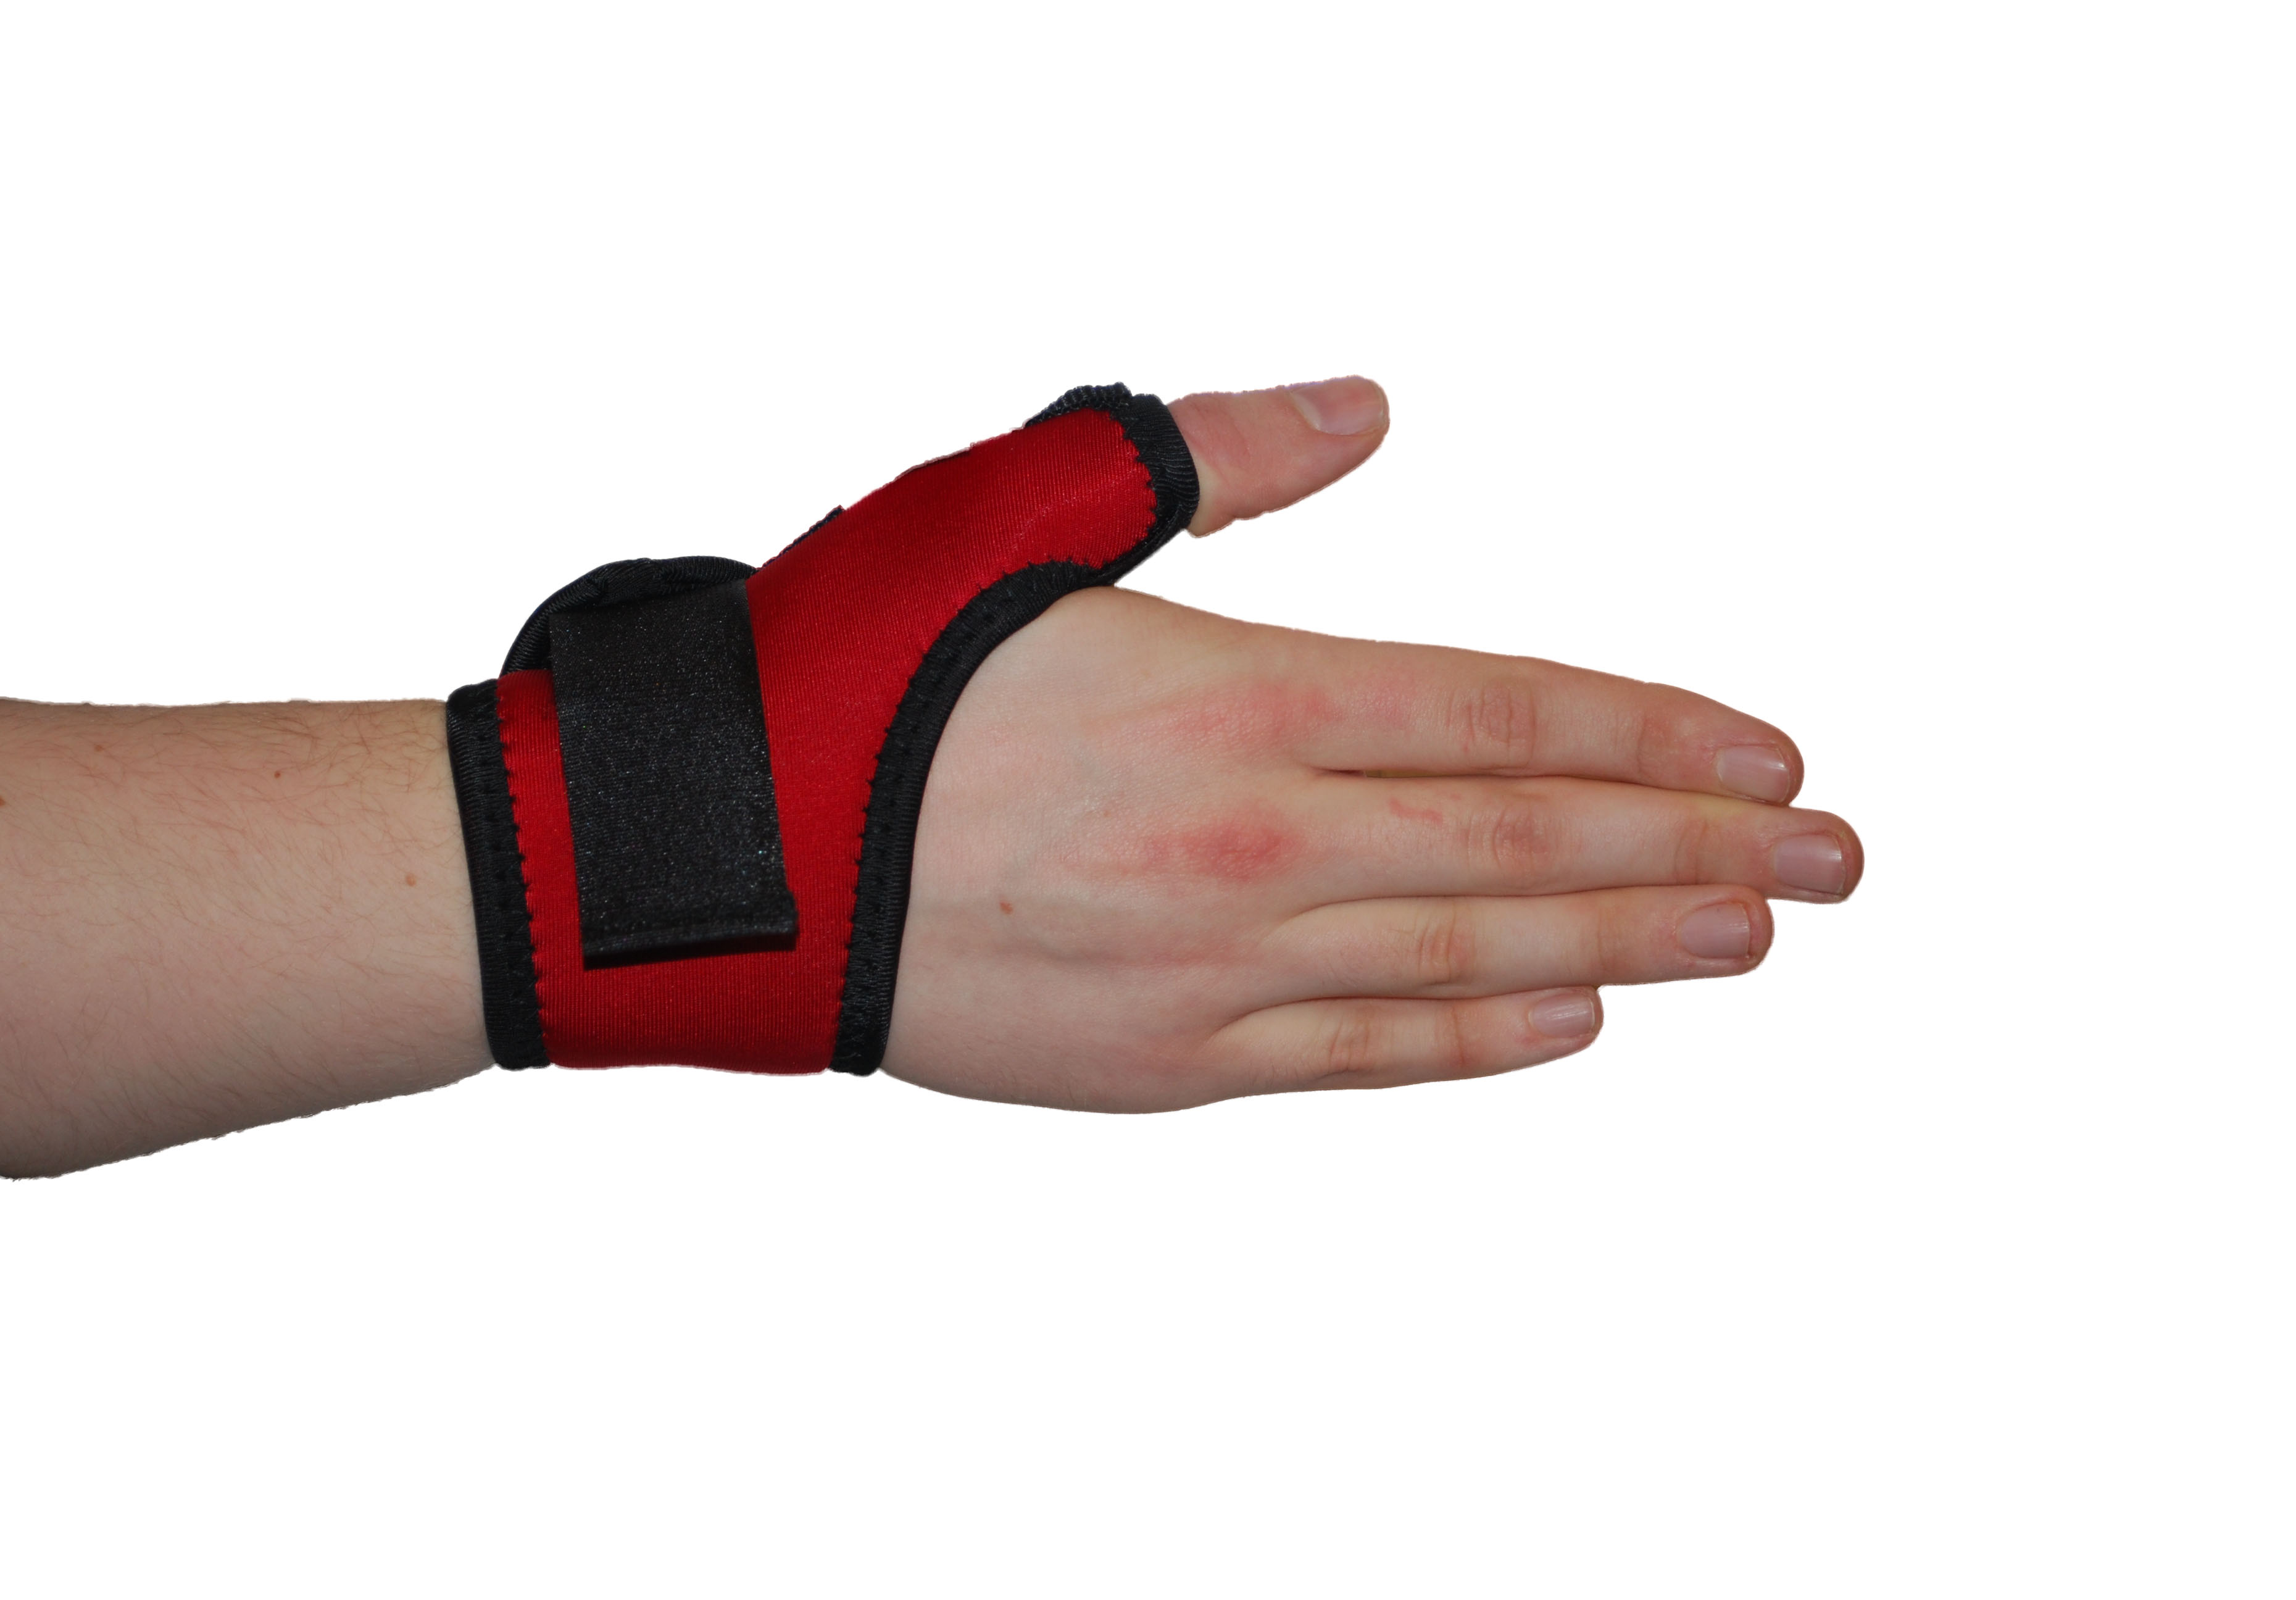 Thumb spica velcro splint